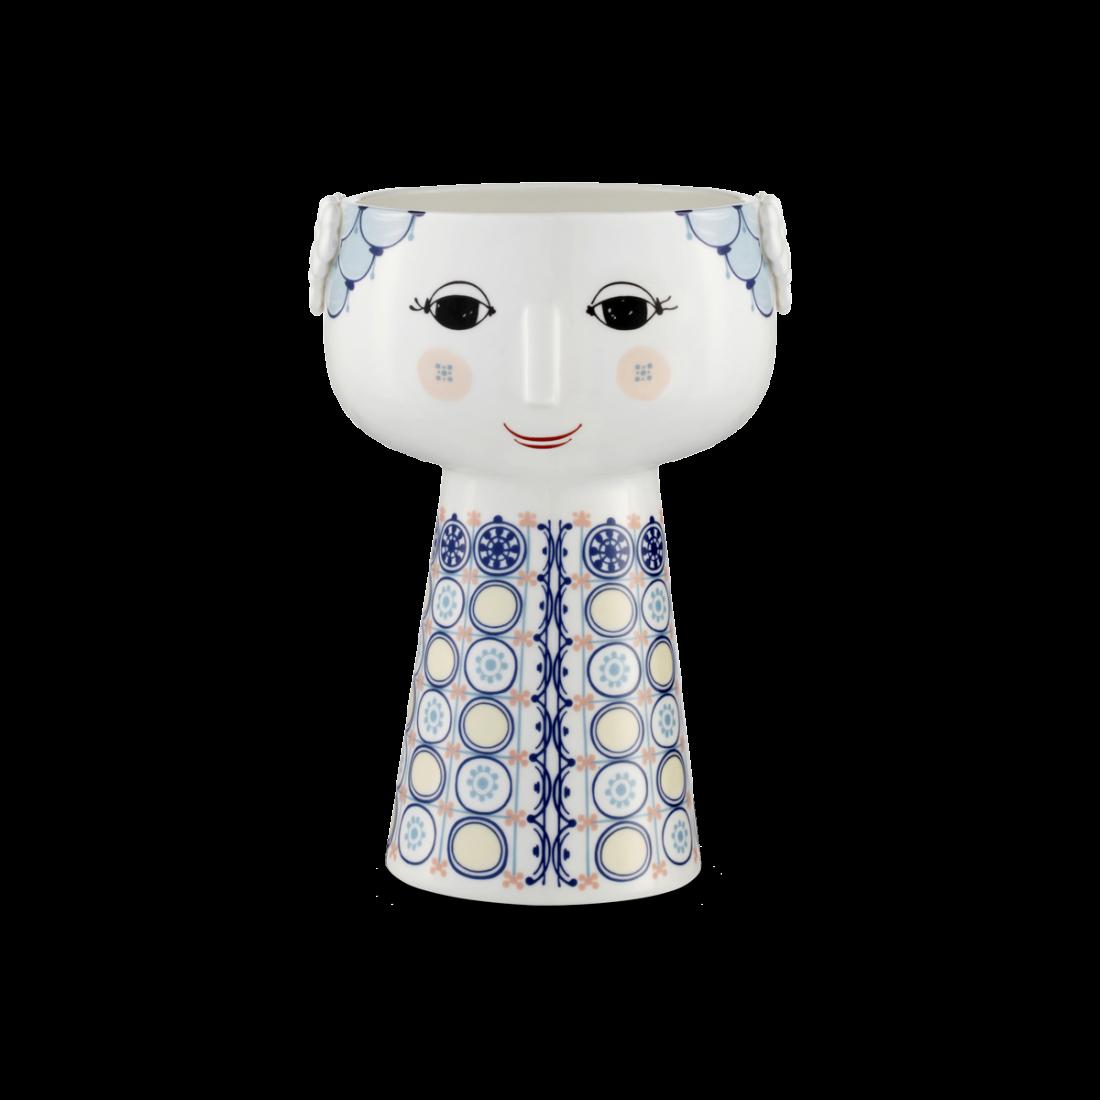 EVA vasen fra Bjørn Wiinblad